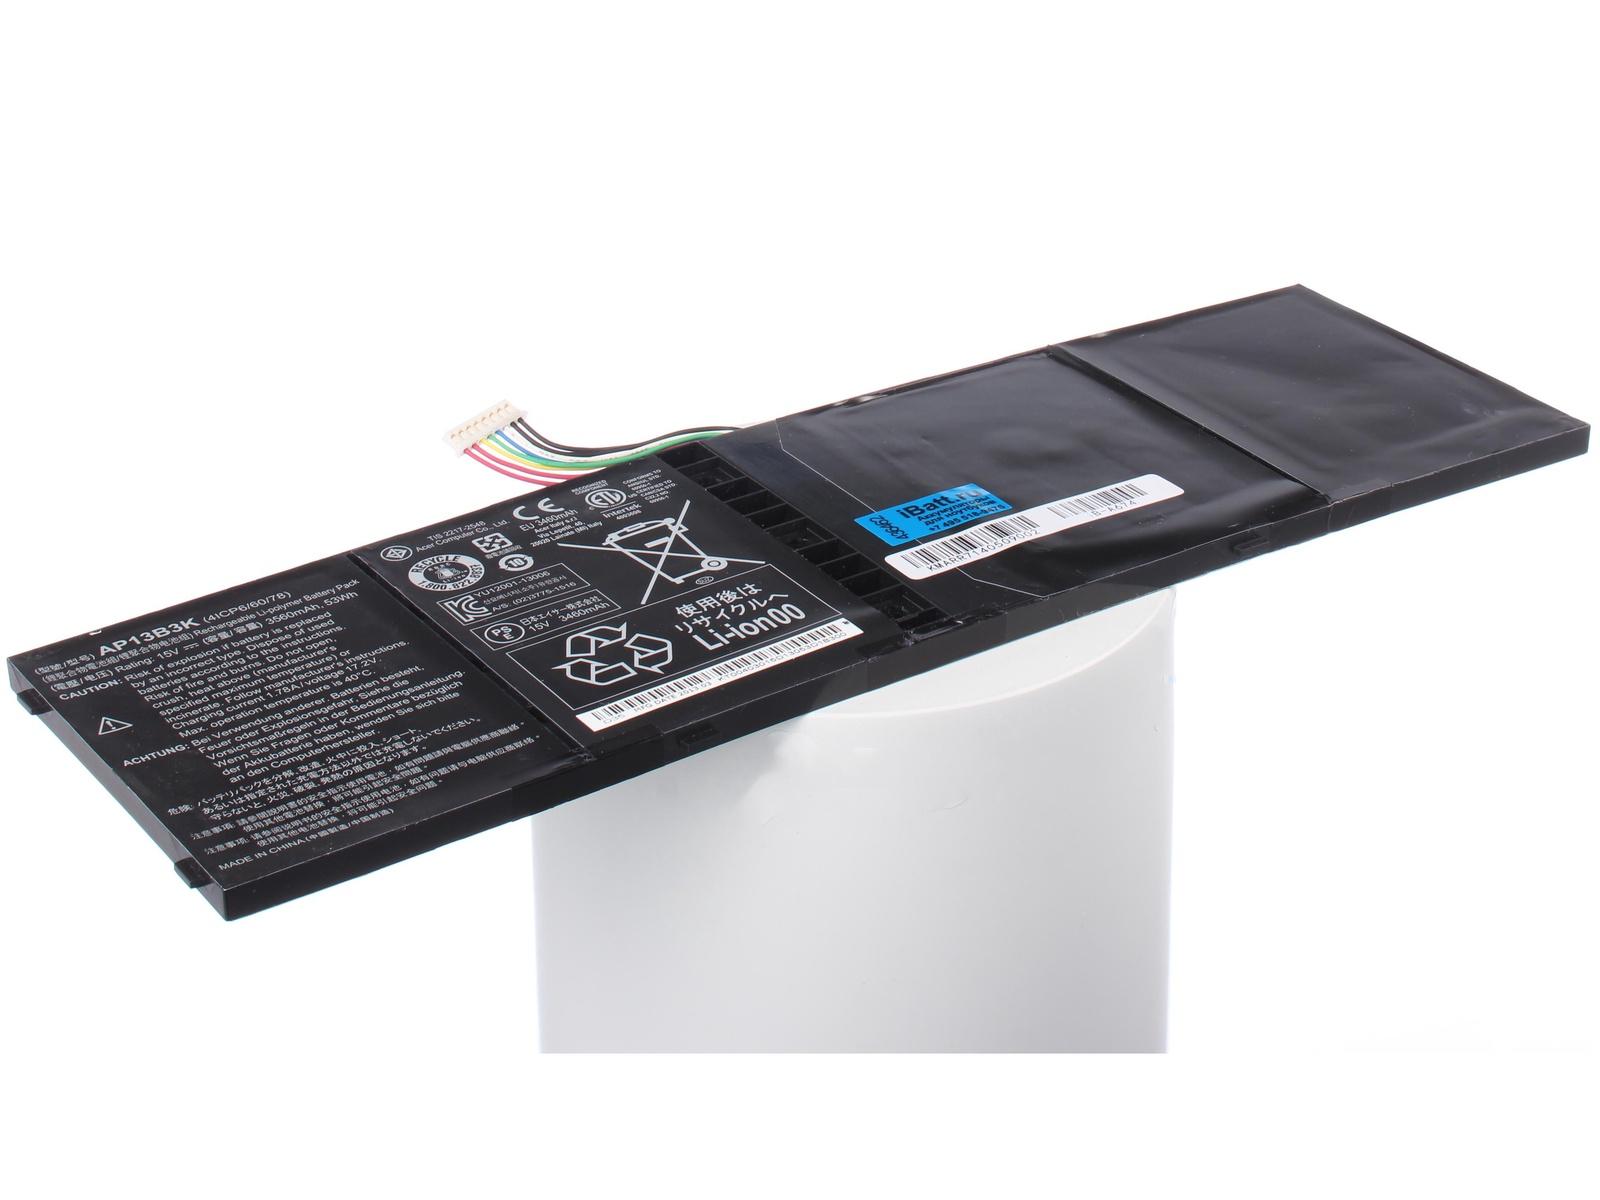 Аккумулятор для ноутбука iBatt для Acer Aspire V5-572PG-33226g50amm, Aspire V5-573G-54208G50aii, Aspire V7-482PG-54206G52tdd, Aspire V7-482PG-74508G52tdd, Aspire R3-471T-56KA, Aspire R7-572-54206G1Ta, Aspire R7-572-54206G50ass gread a 14 lcd touch screen digitizer assembly display for acer aspire r3 471 r3 471tg 1366 768 30pins